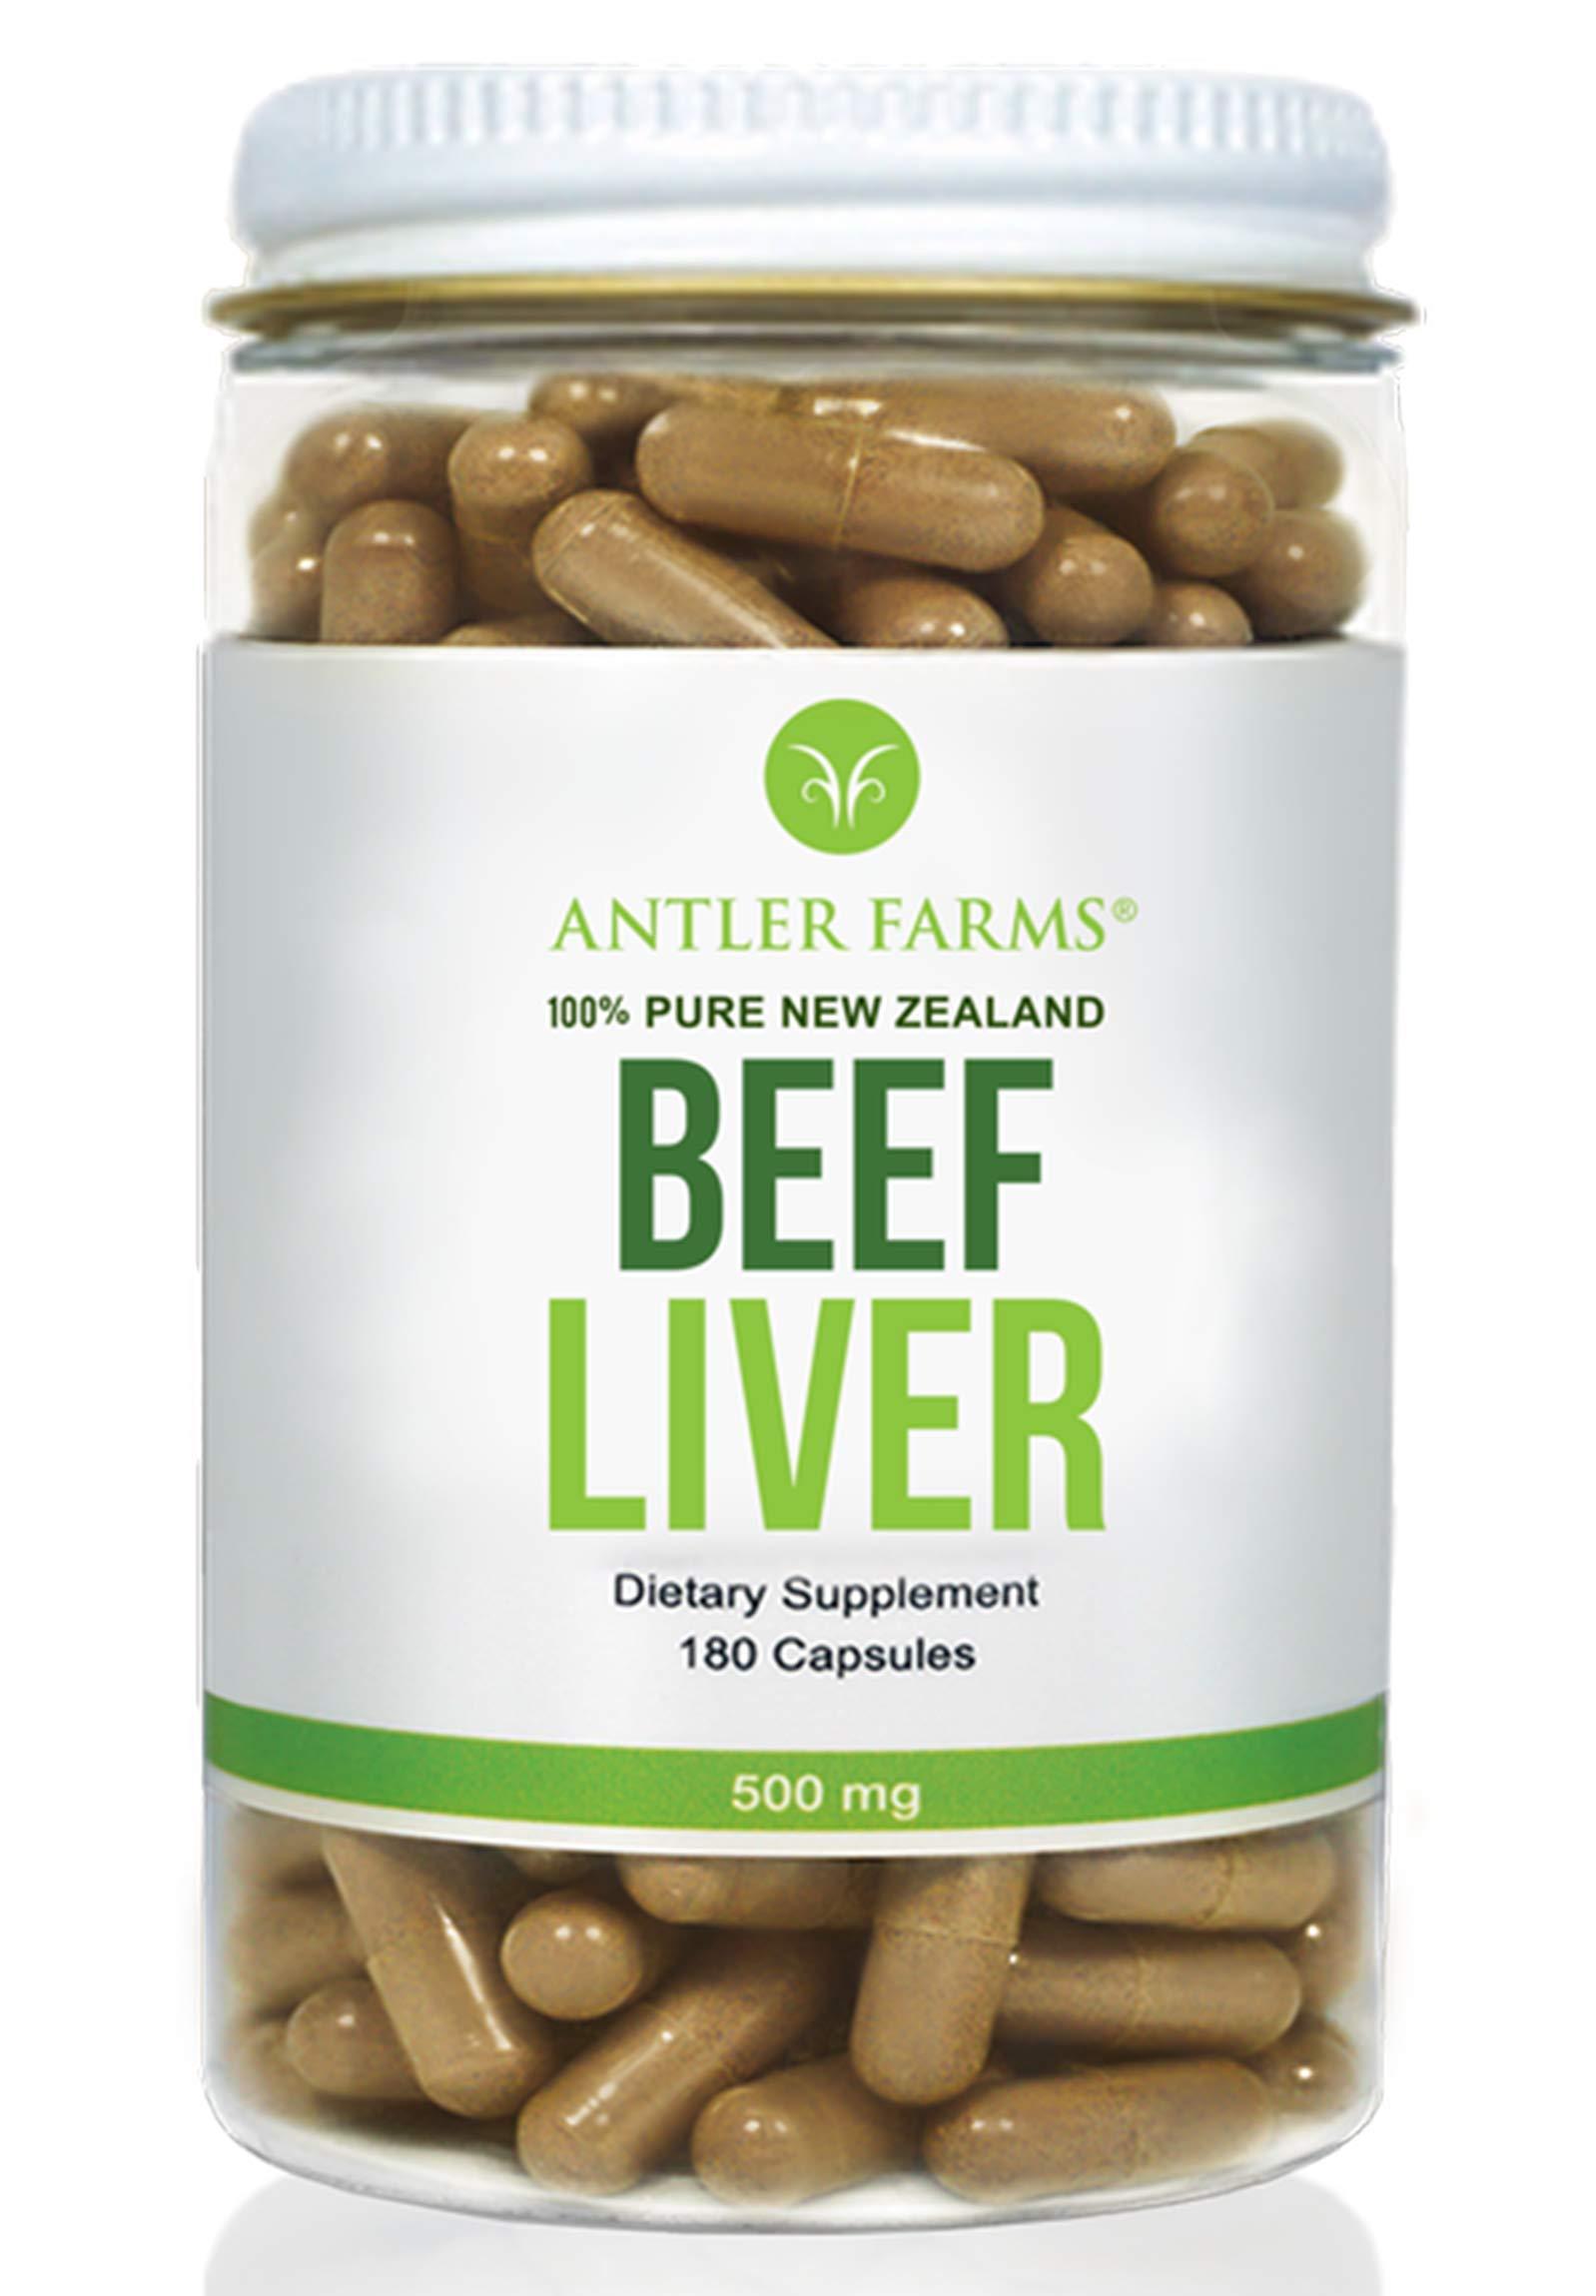 Antler Farms - 100% Pure New Zealand Beef Liver, 180 Capsules, 500mg - Grass Fed, Cold Processed Supplement, NO Hormones, NO Antibiotics, NO Chemicals, NO GMOs